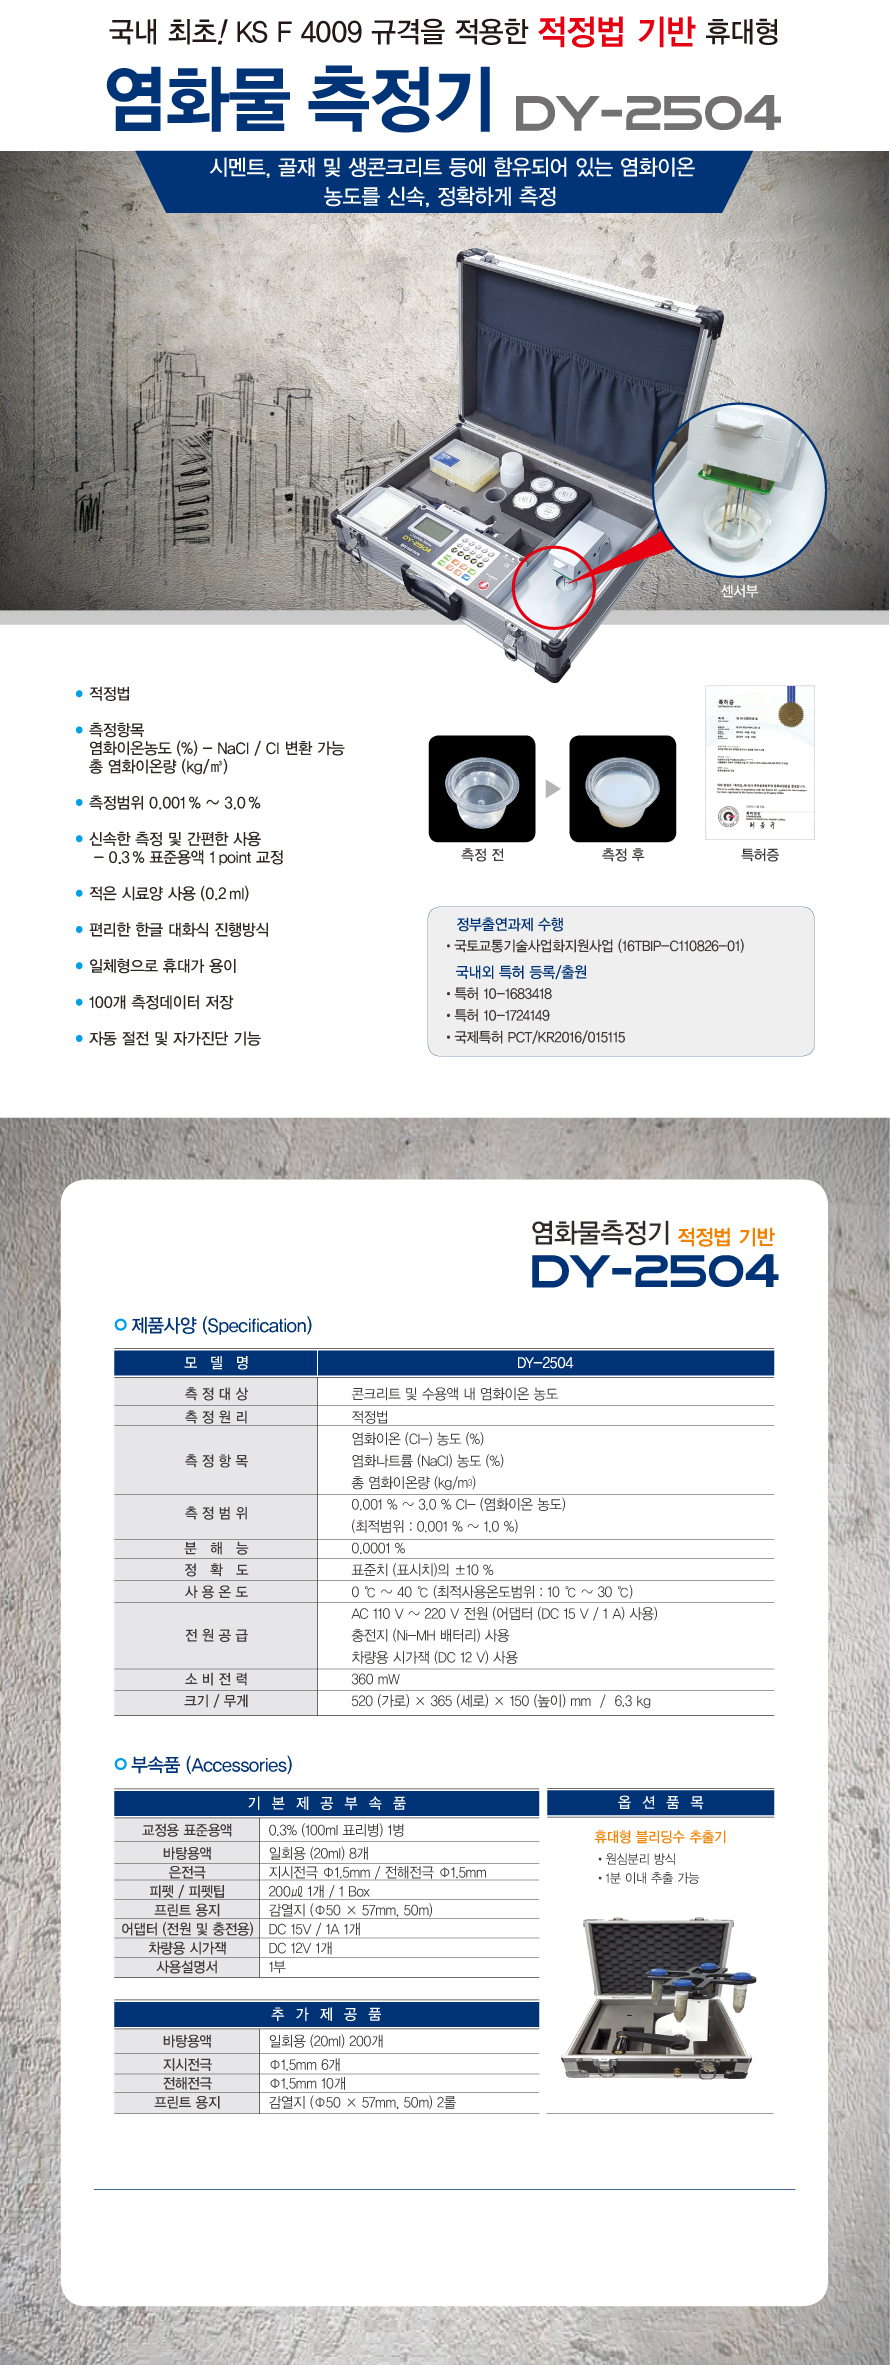 DY-2504 염화물 측정기